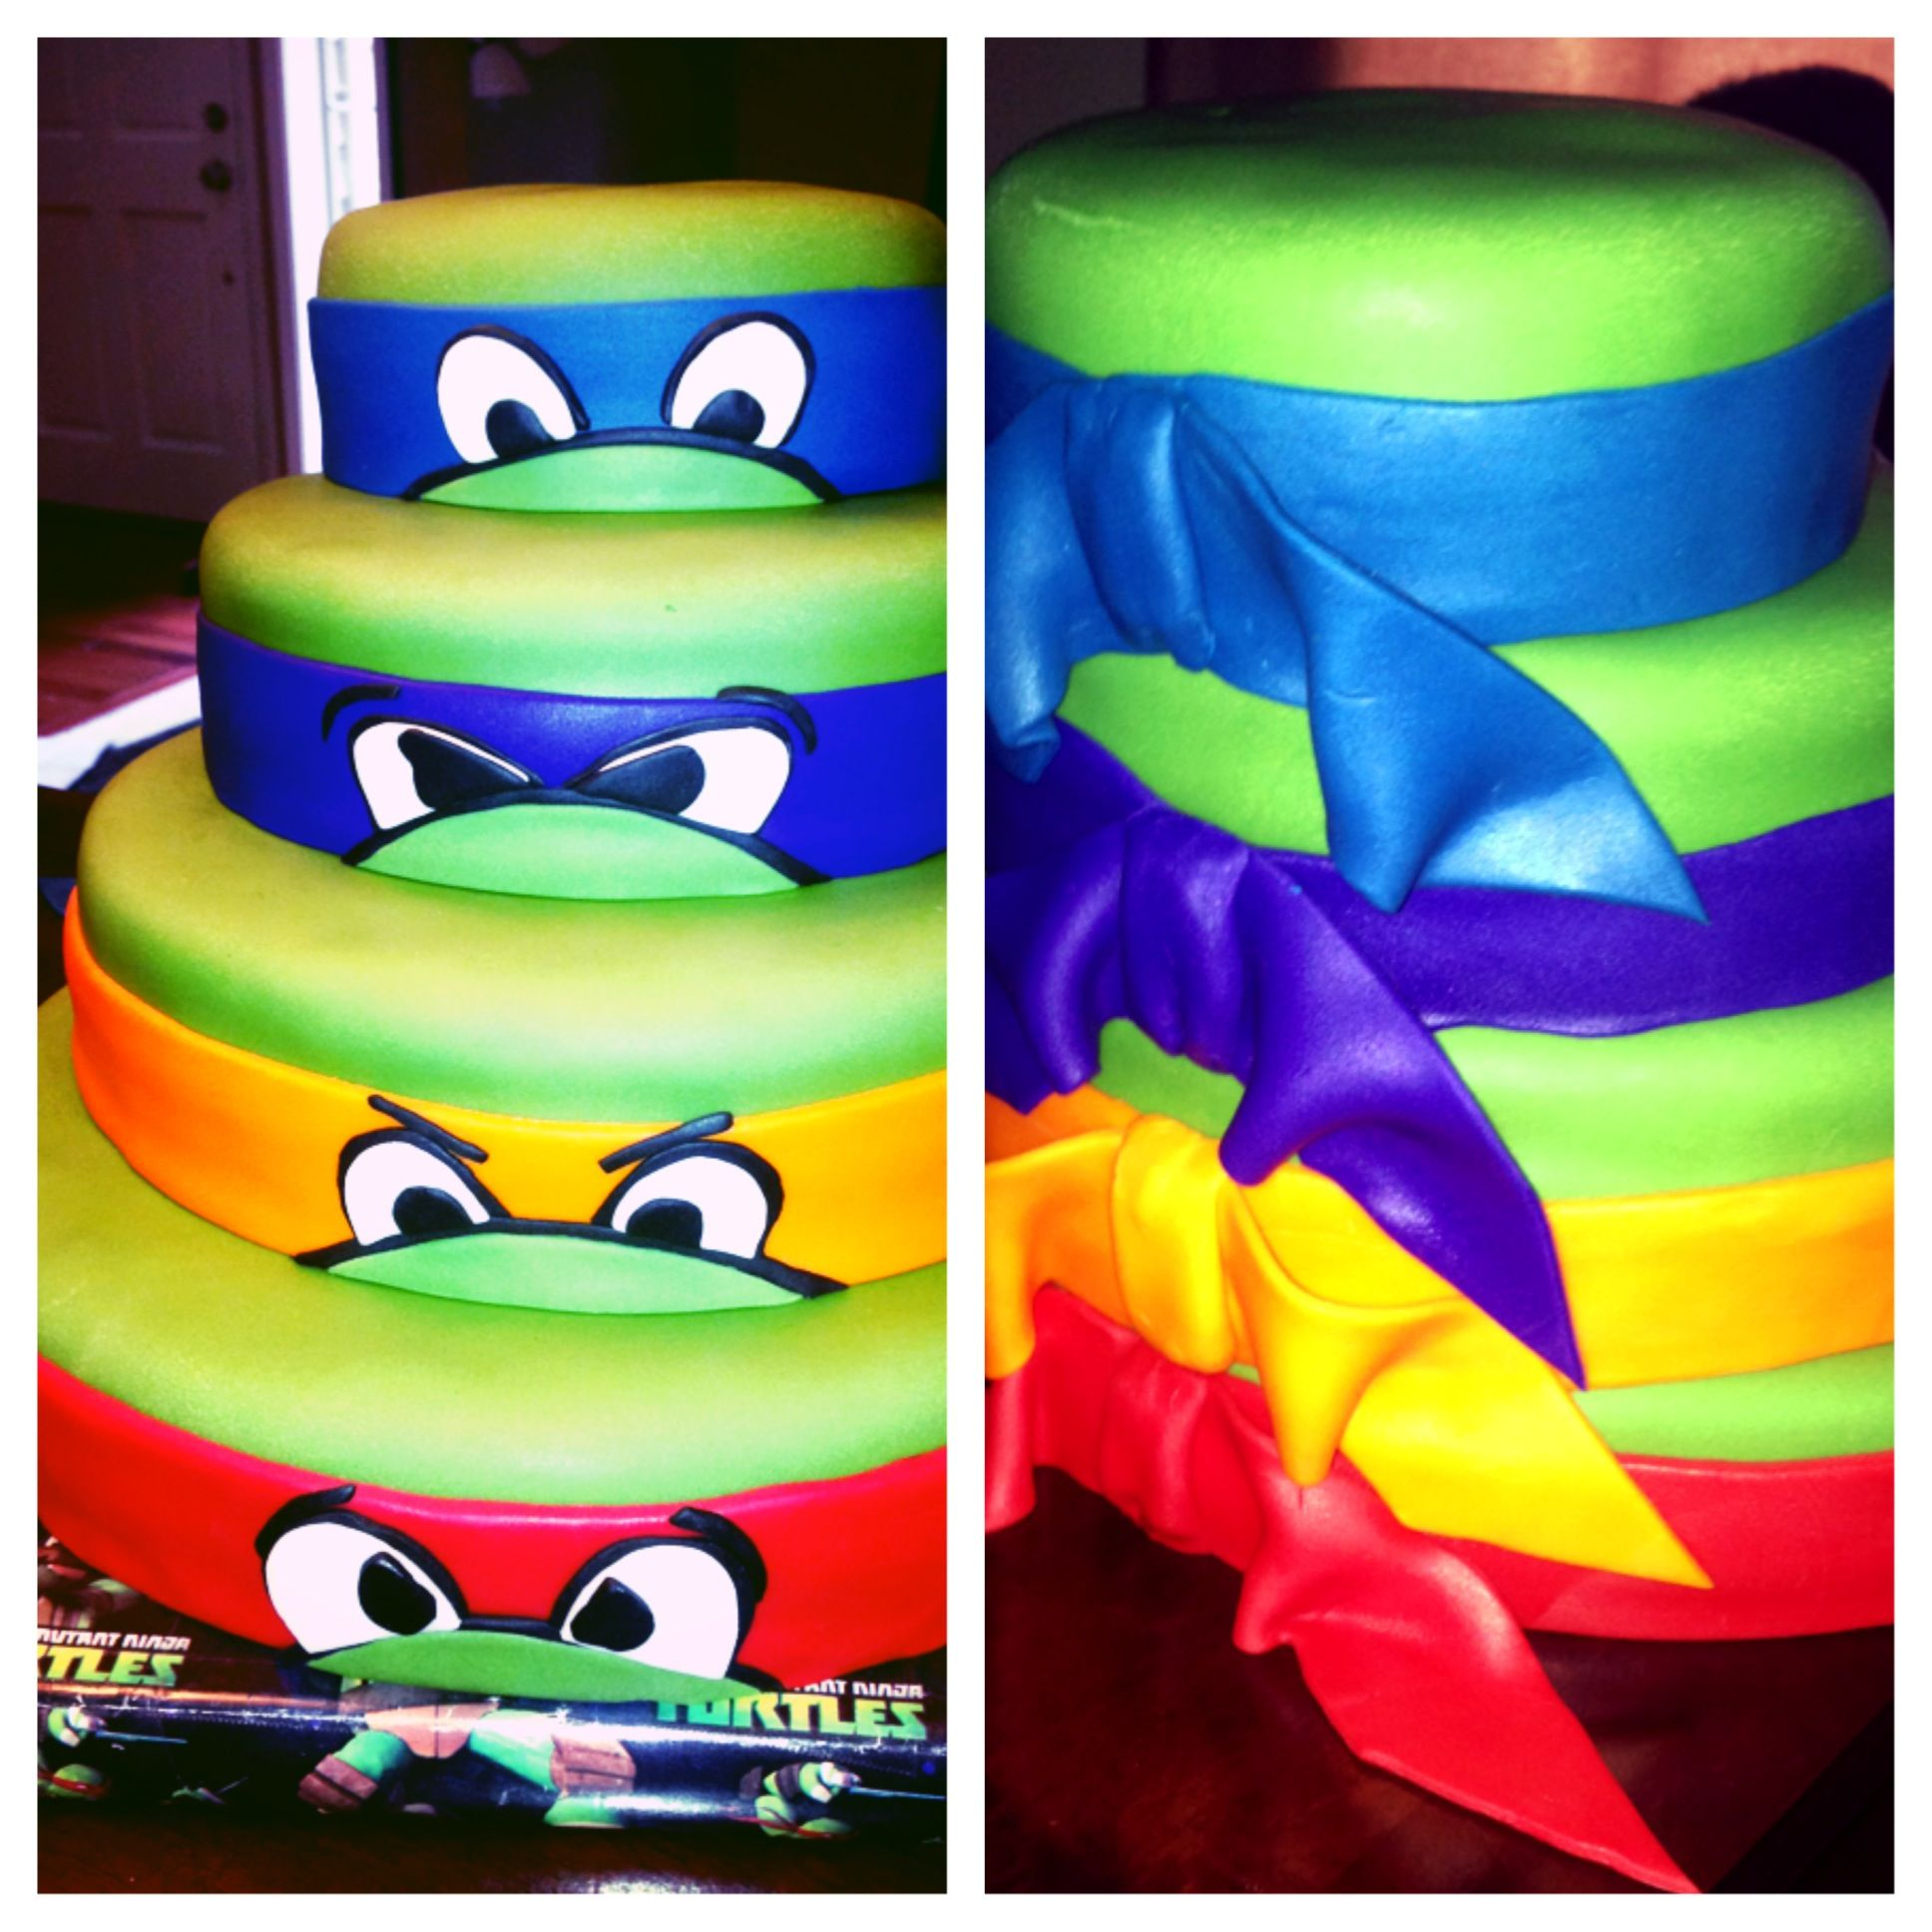 Pin By Crystal Rellaford On Ashton S 4th Birthday Ninja Turtles Birthday Party Turtle Birthday Parties Ninja Turtle Cake